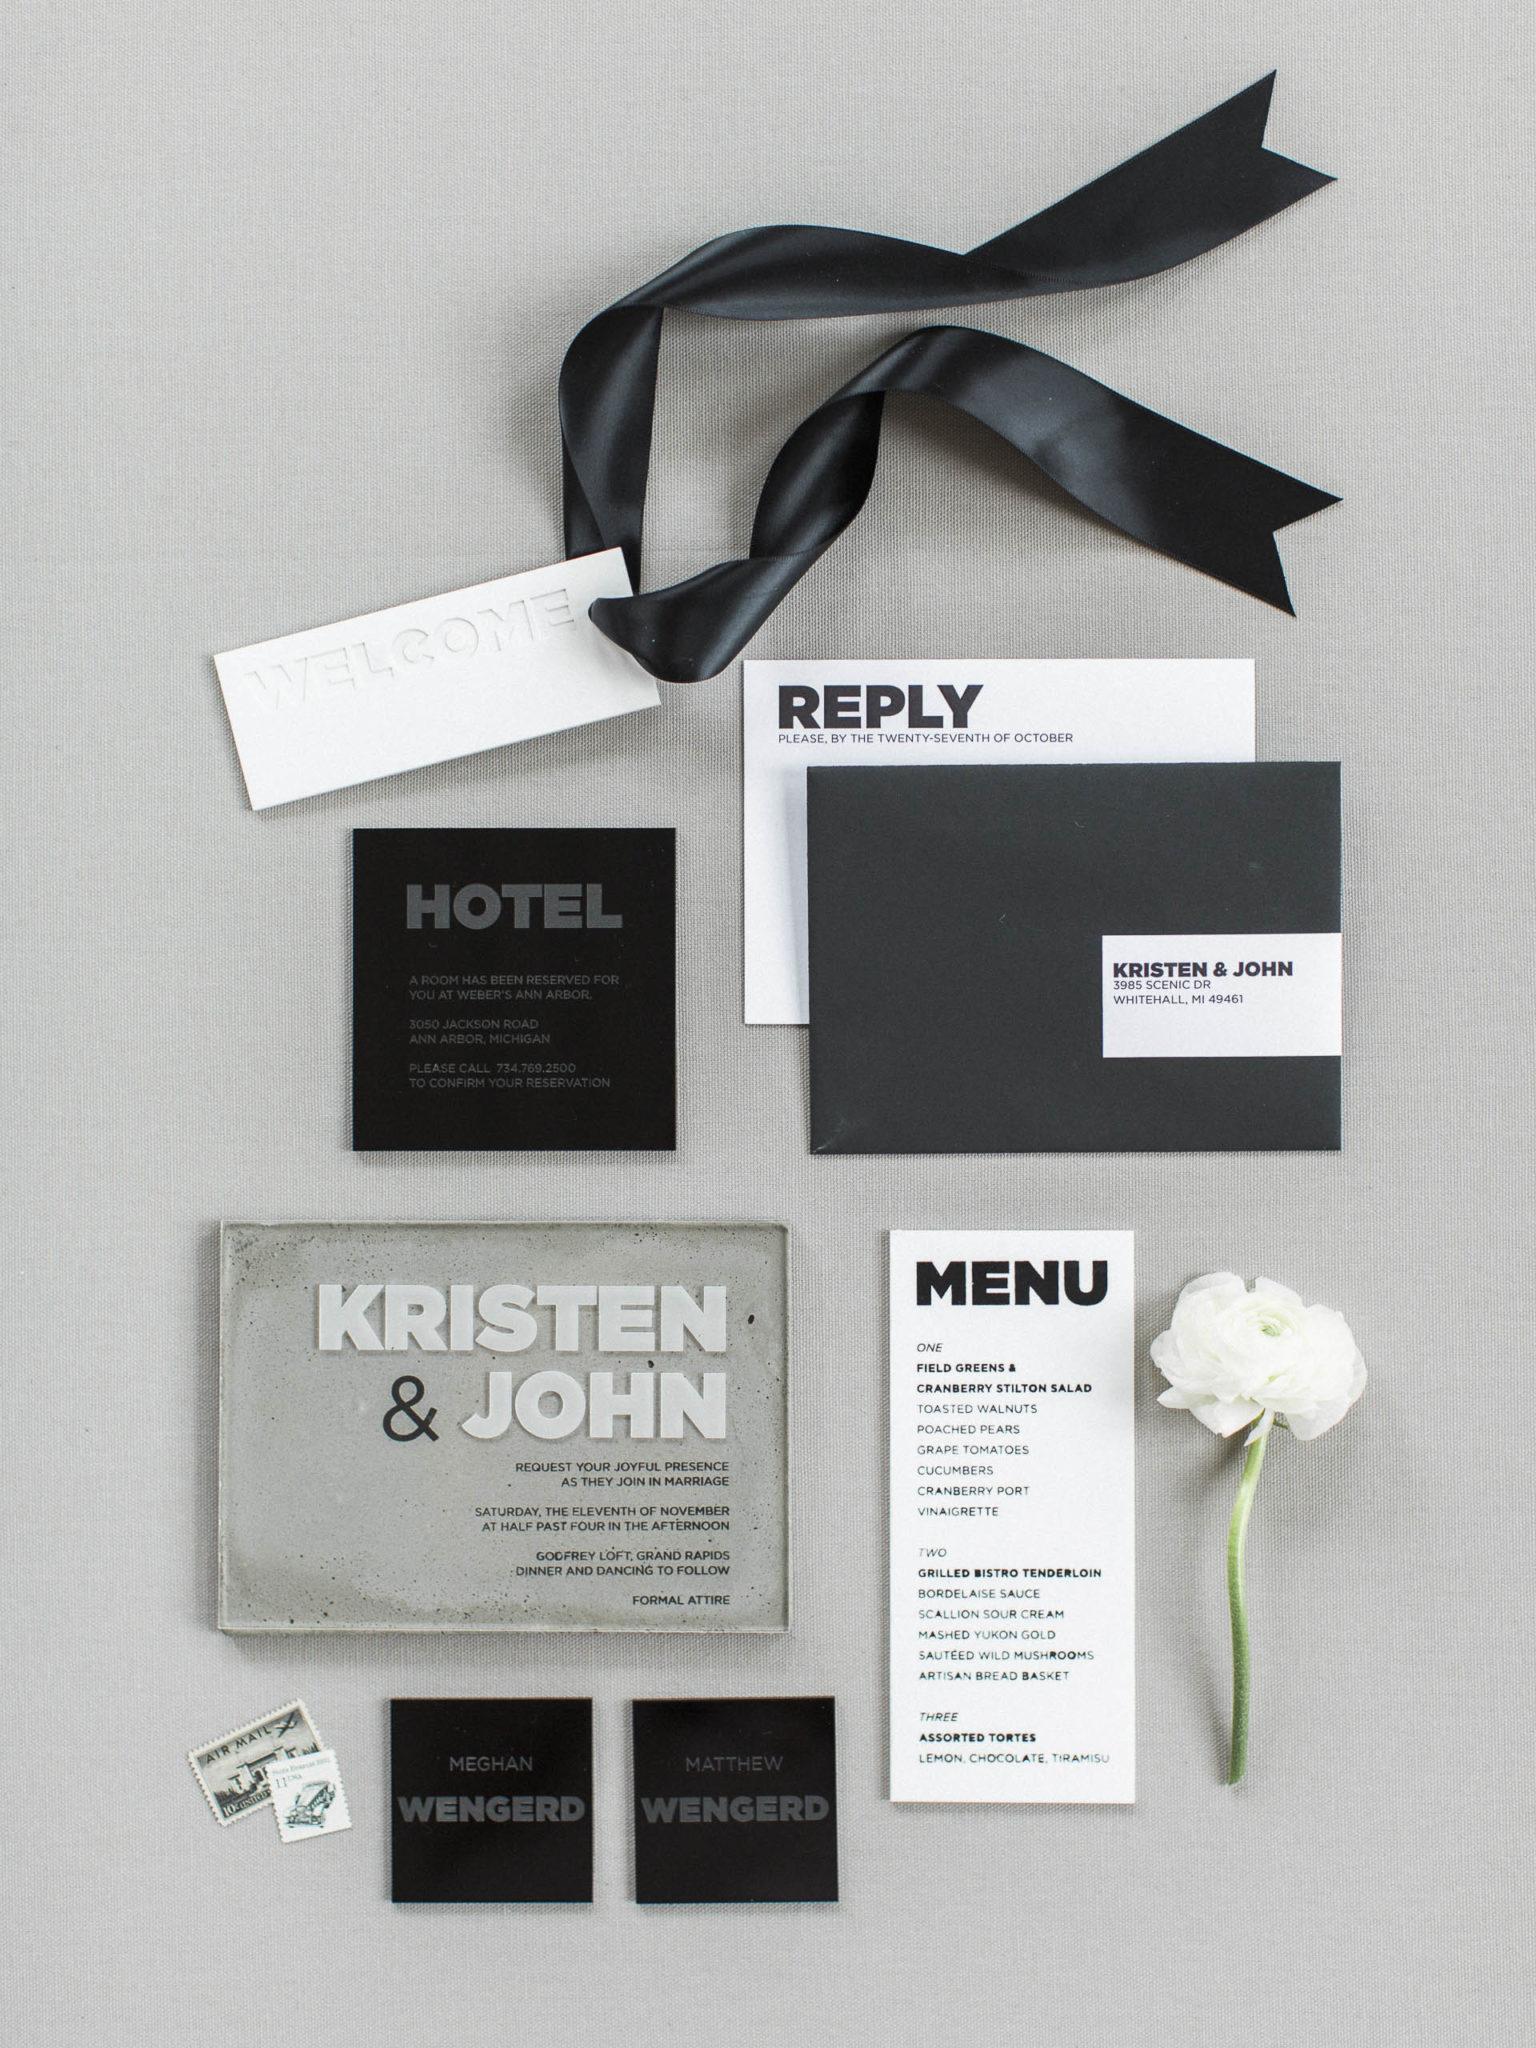 Acrylic + Concrete Masculine Elegance - Weddings - A Fine Press